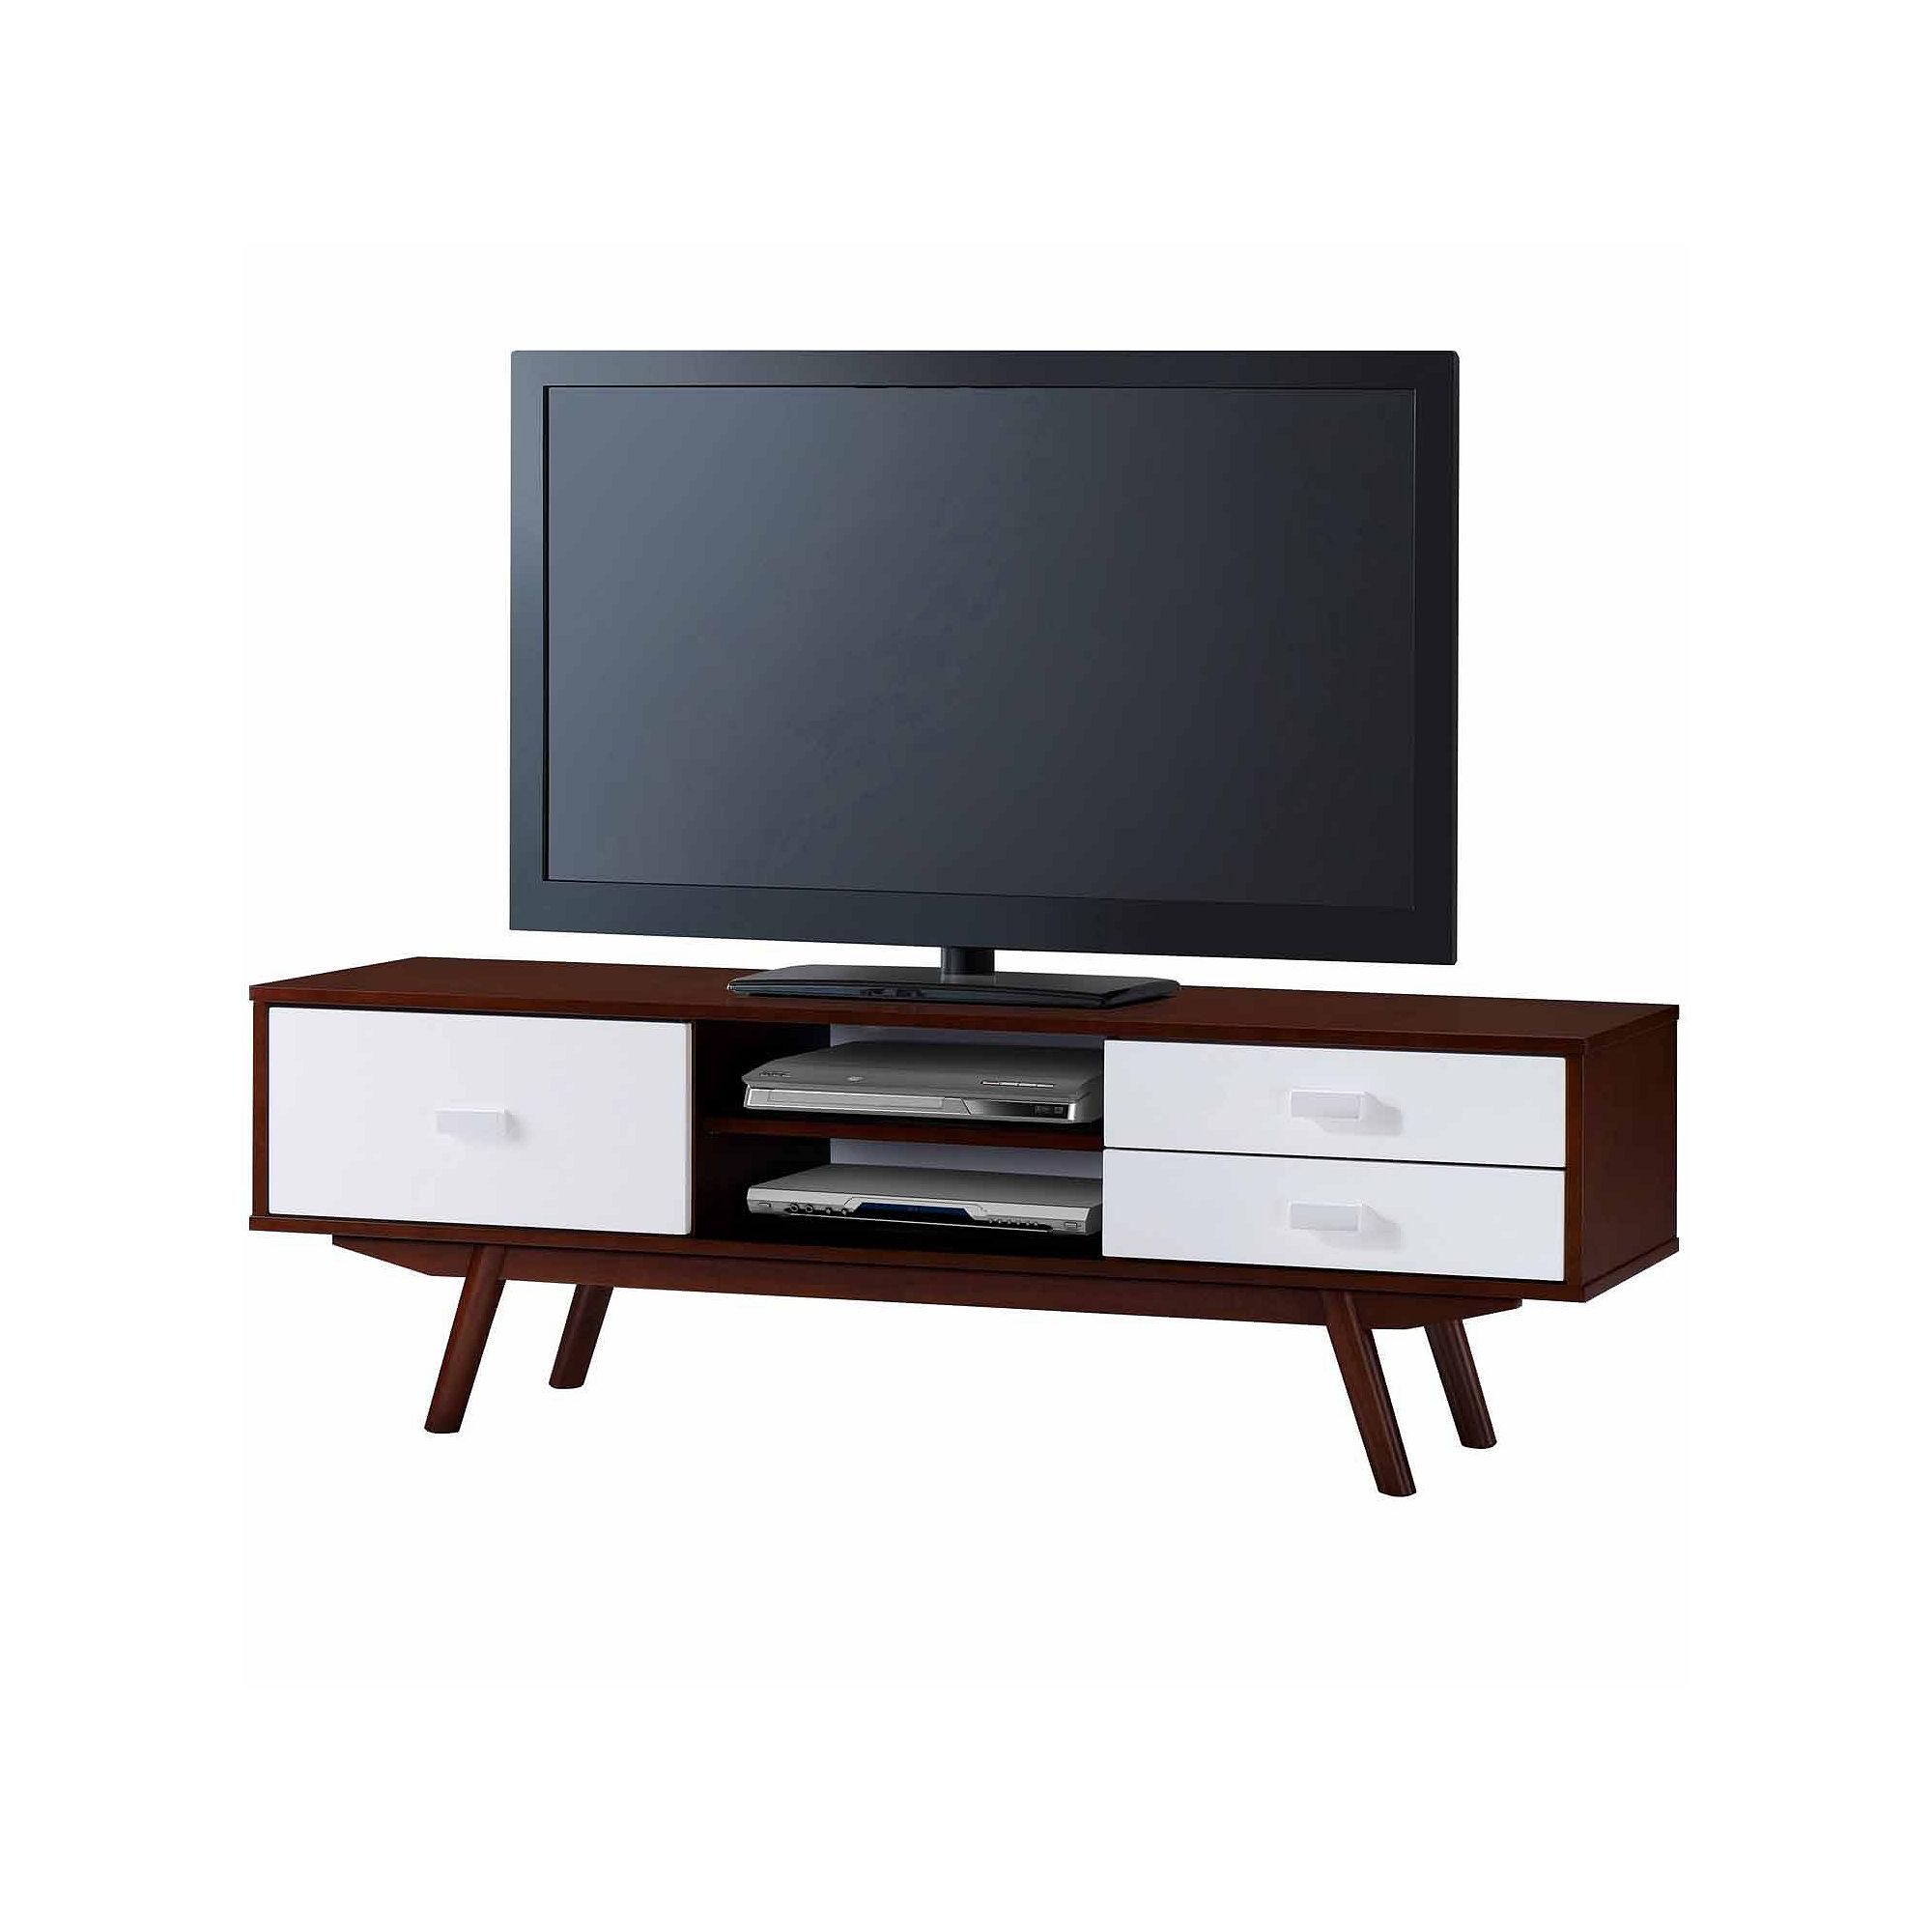 Techni Mobili Retro Wood Veneer TV Stand